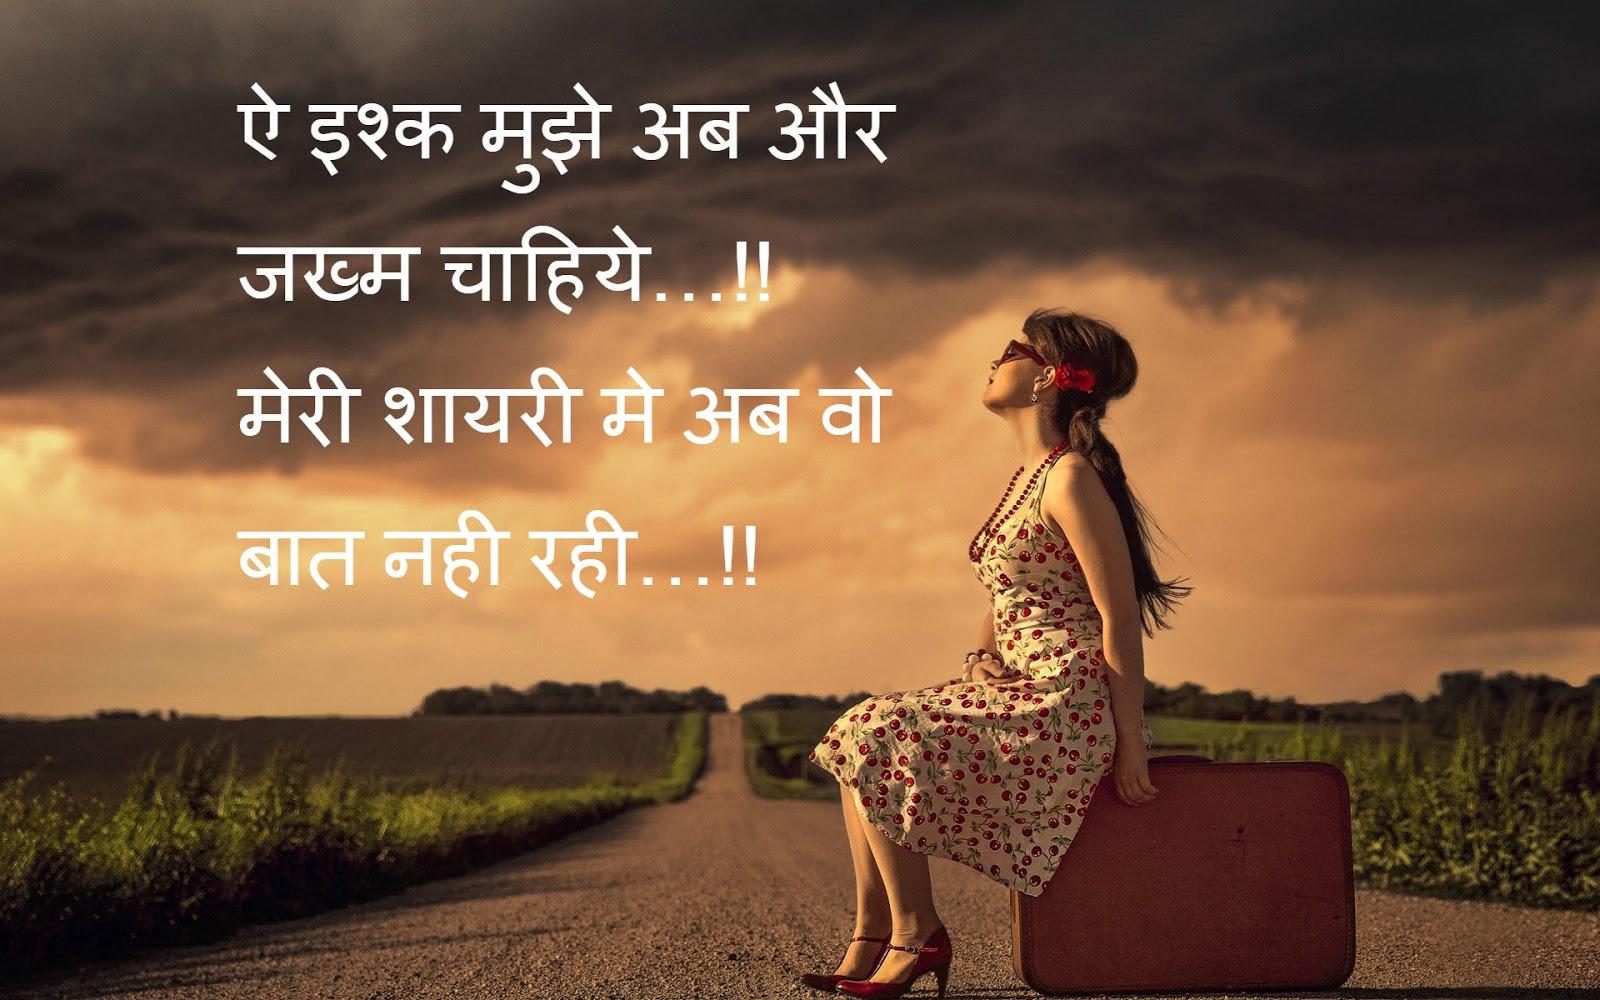 Two Line Shayari In Hindi On Life Whatsapp Status - AllStatusGuru